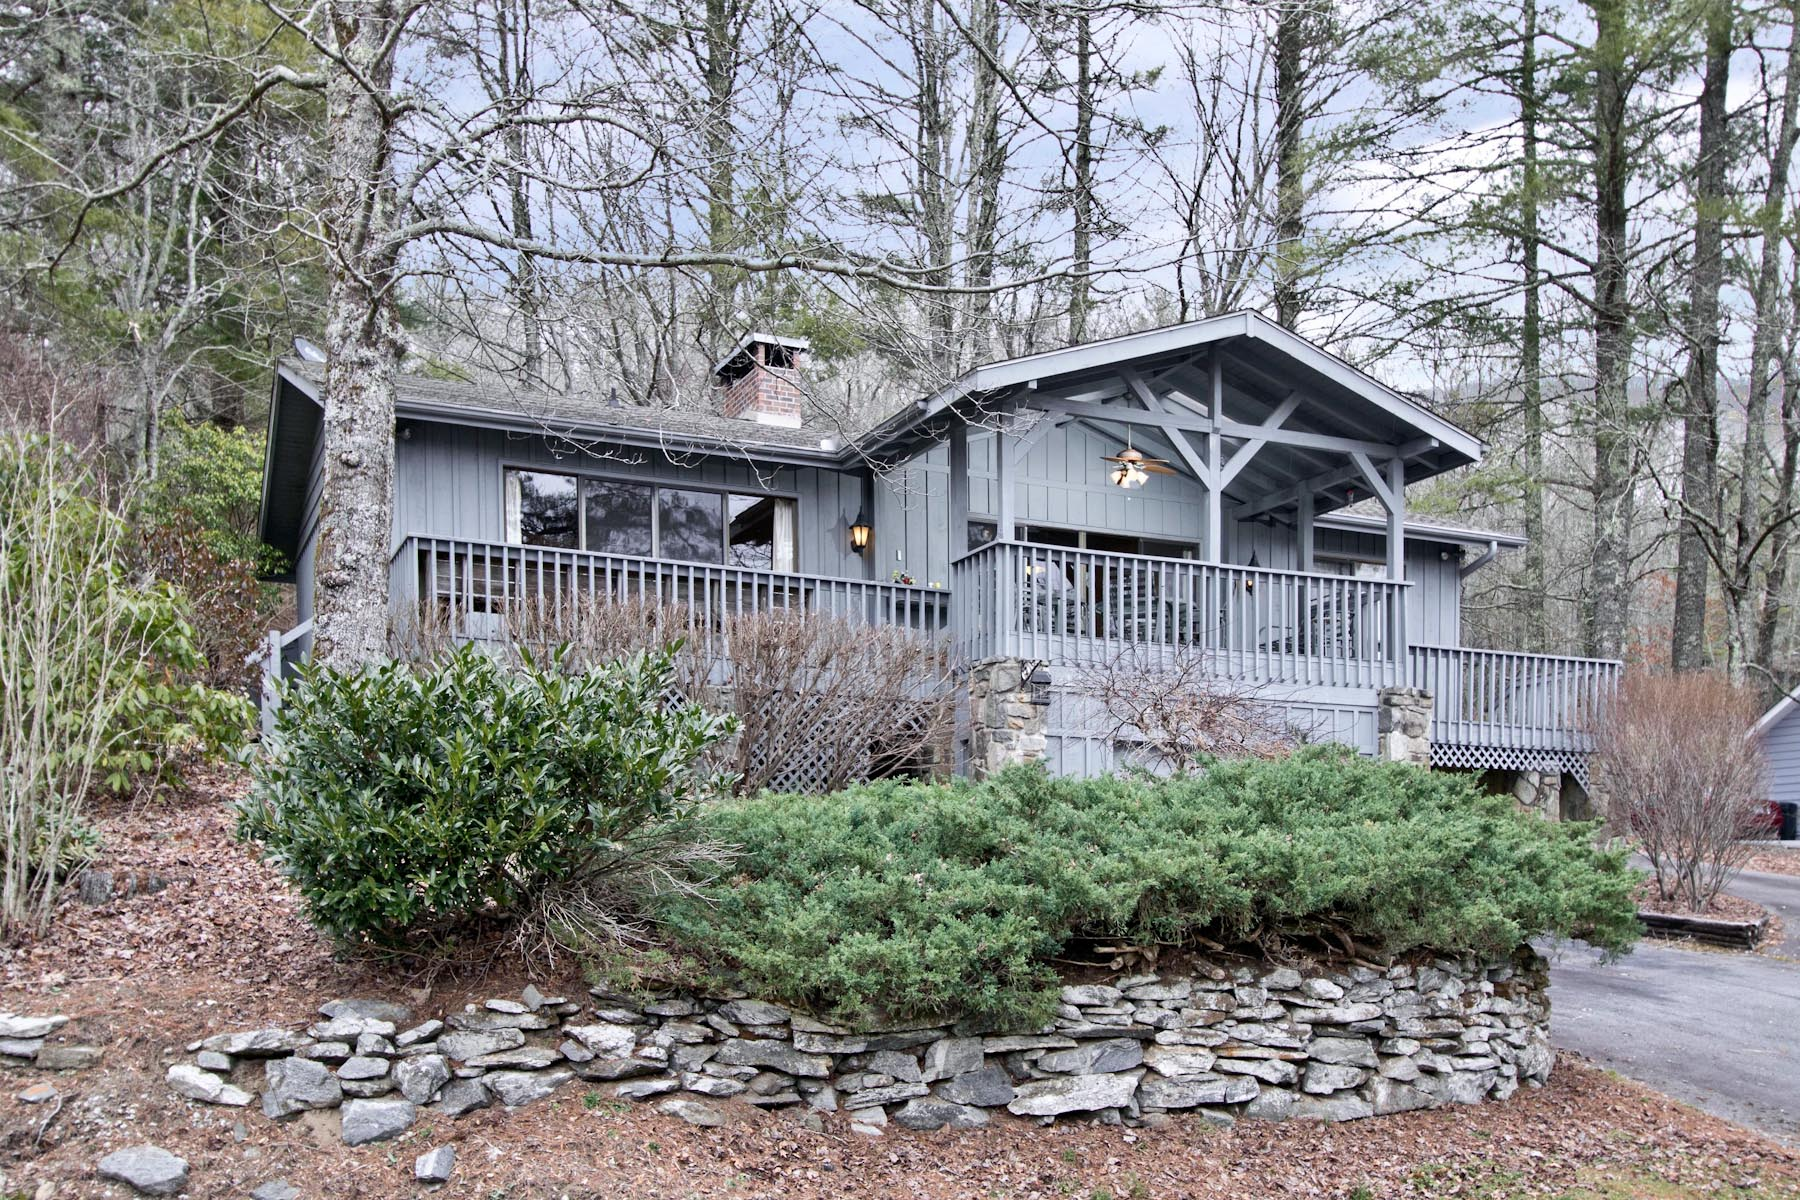 Single Family Home for Sale at 1115 Skylake Drive Highlands, North Carolina, 28741 United States